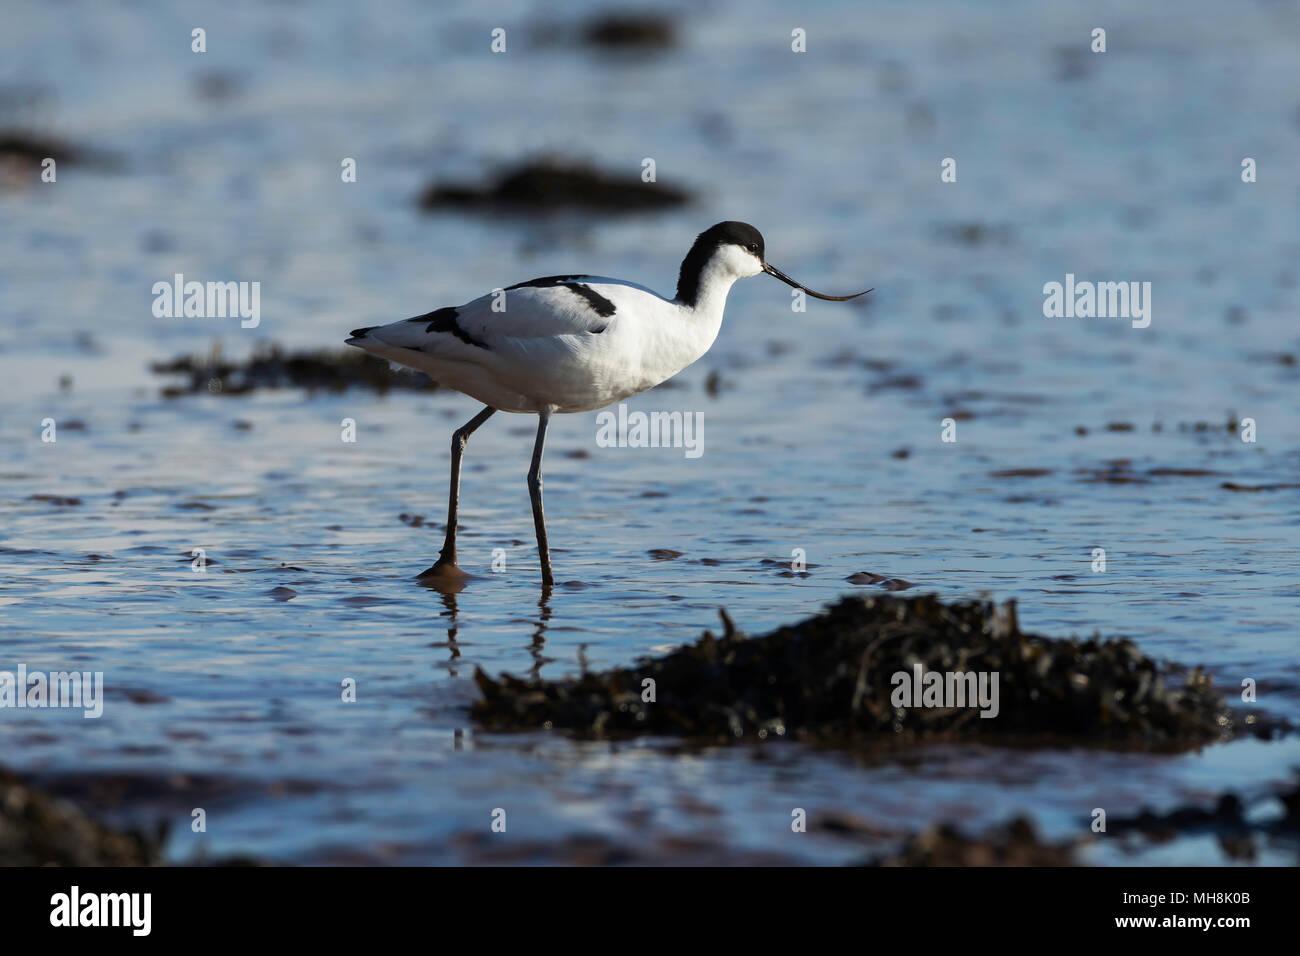 Avocet on the River Exe Estuary - Stock Image